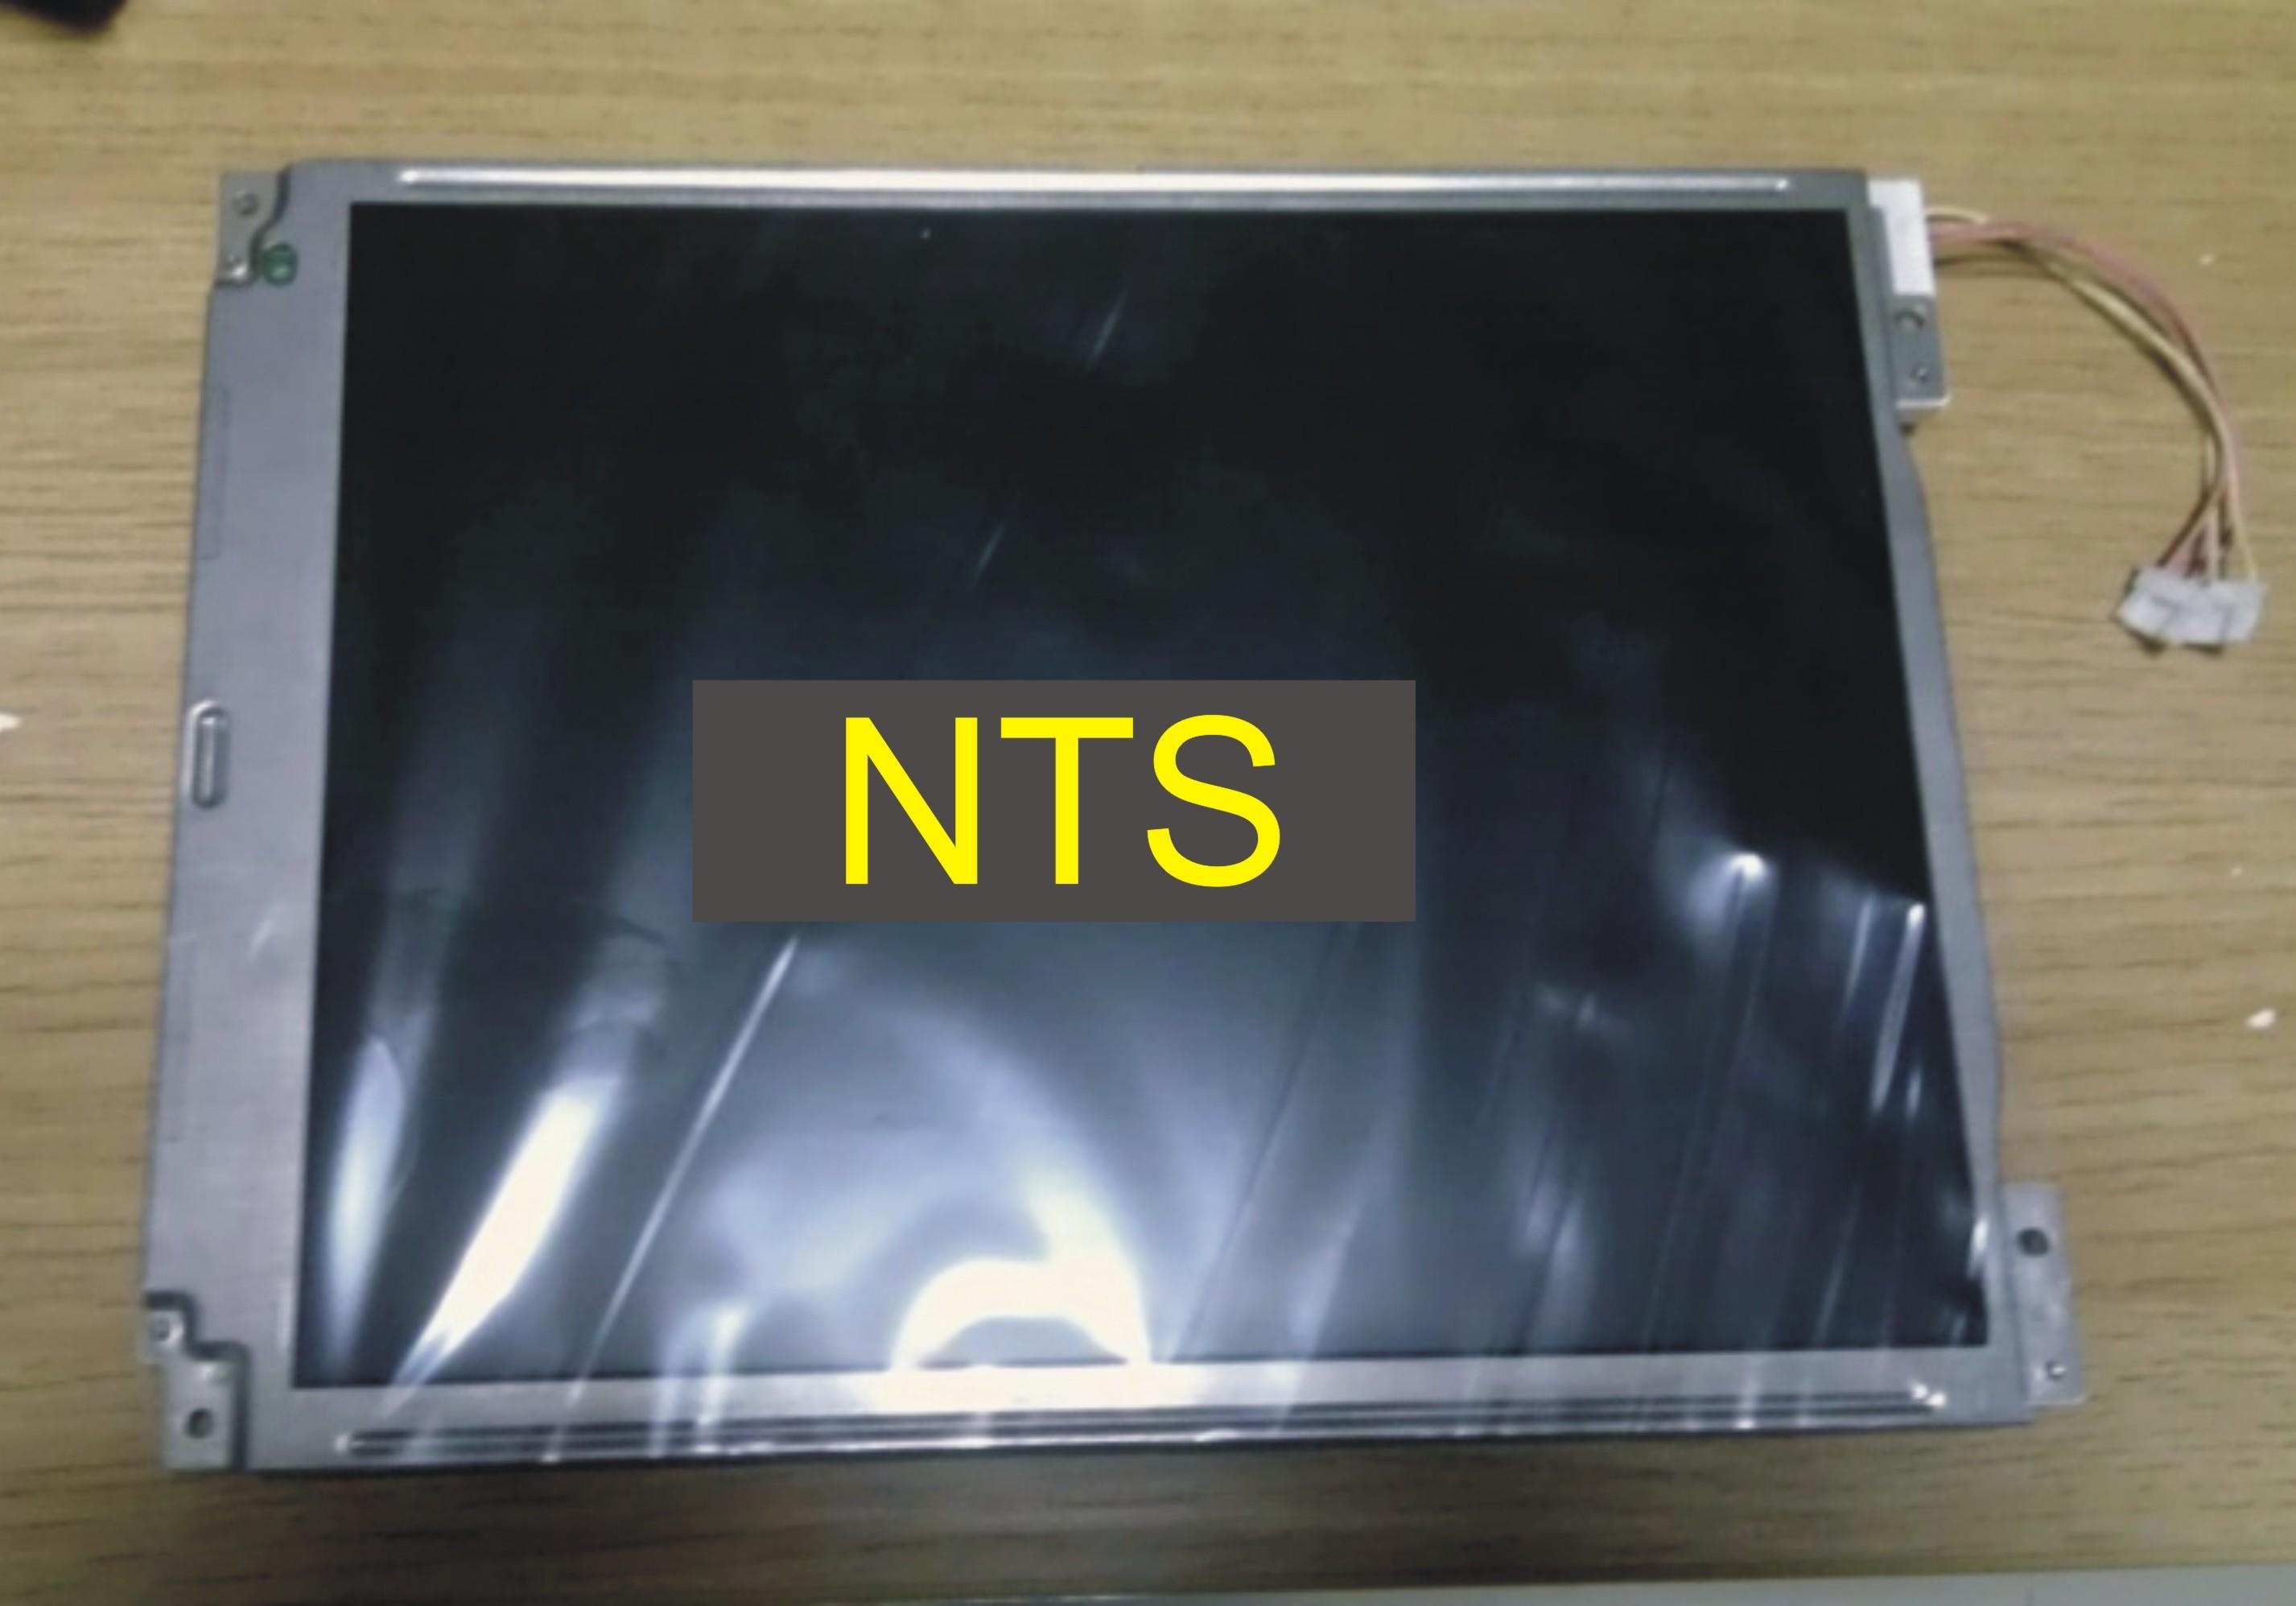 LQ104V1DG52 LCD Display